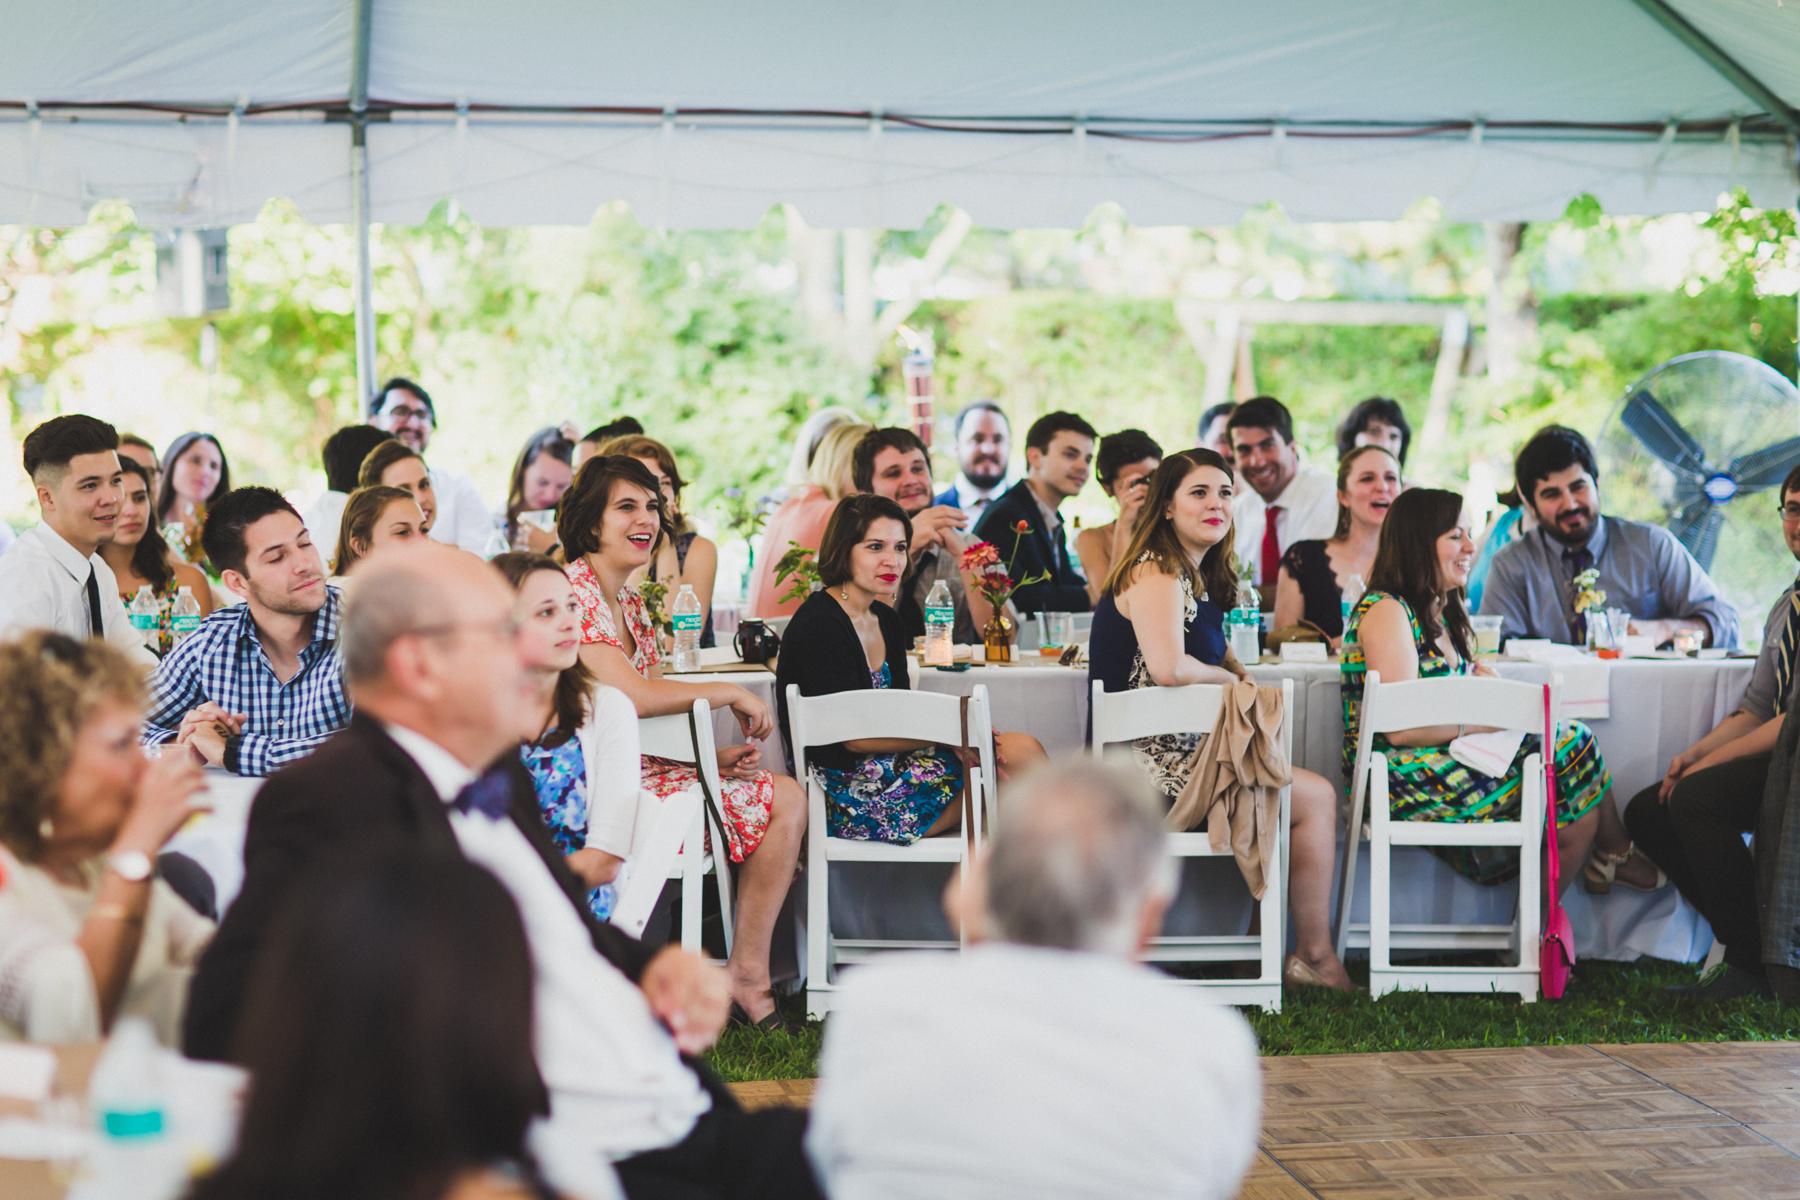 Long-Island-Documentary-Wedding-Photography-Summer-Tent-Wedding-in-New-York-124.jpg